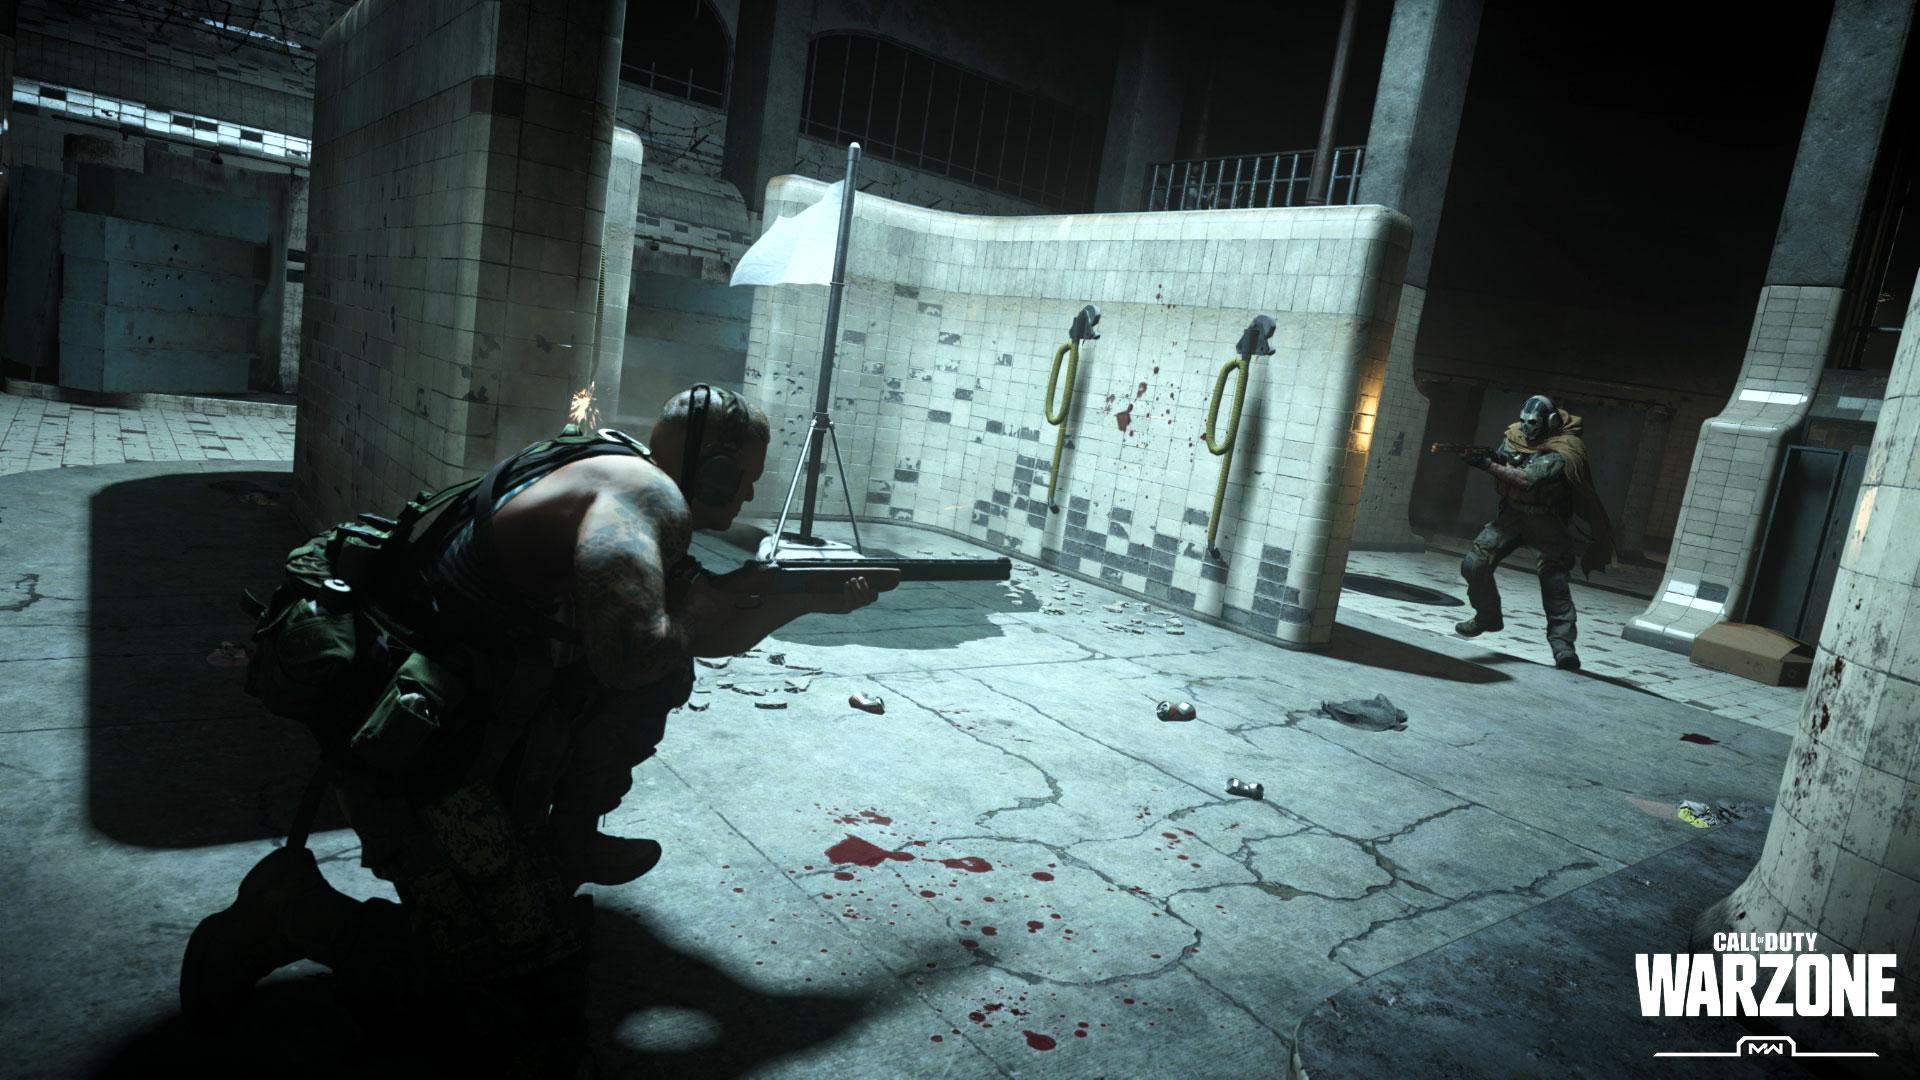 Warzone Mode Recon: Battle Royale - Image 3